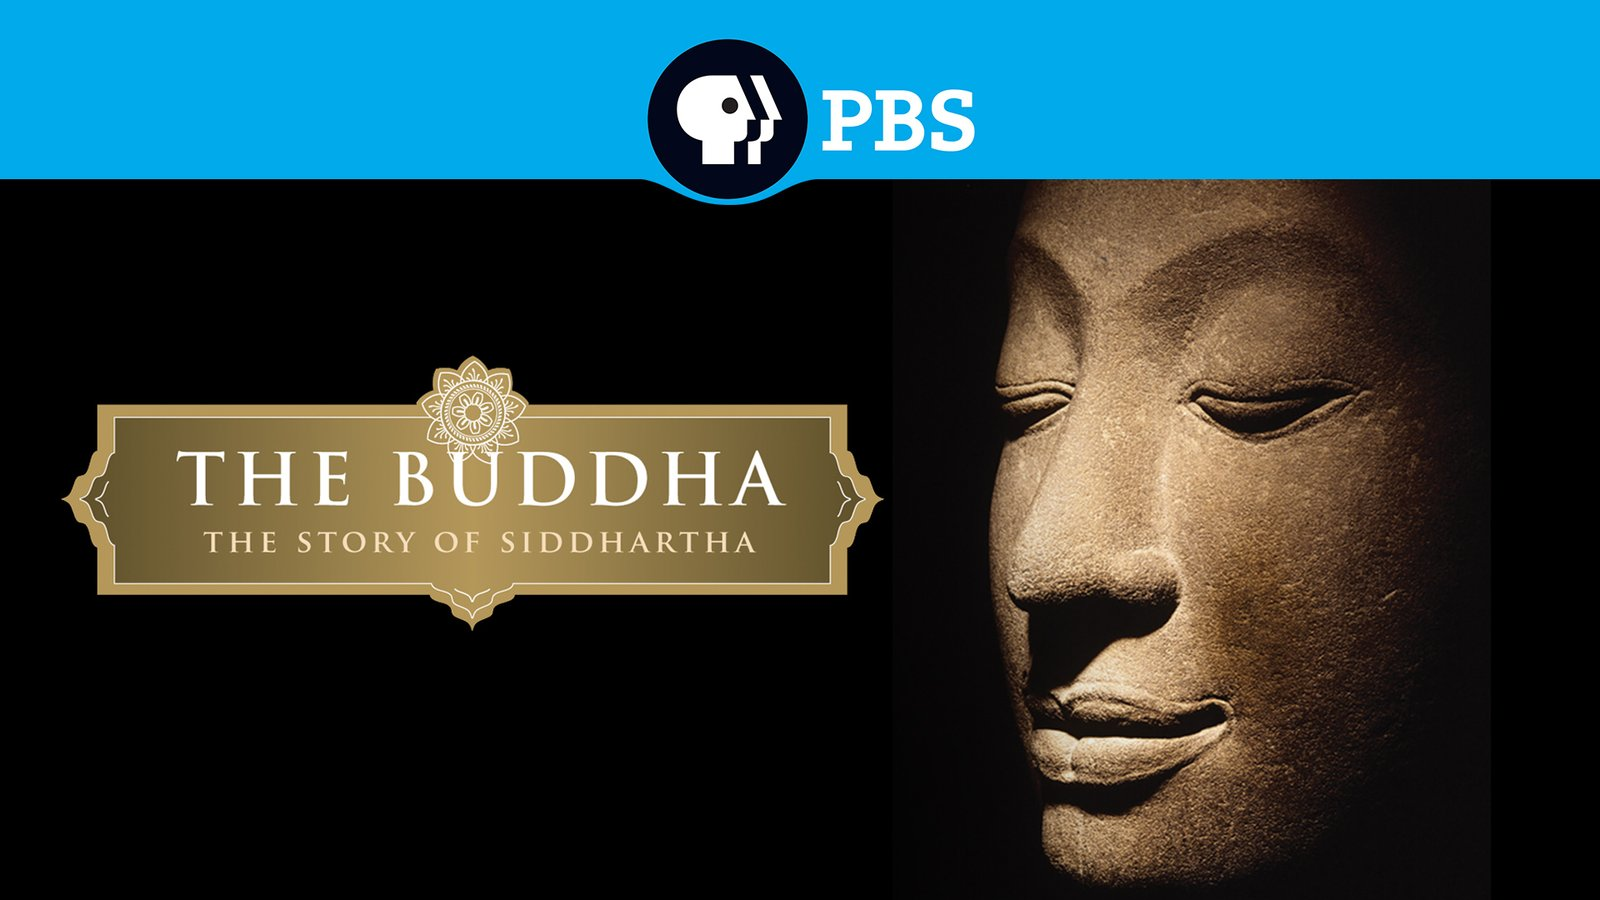 The Buddha - A History of Buddhism